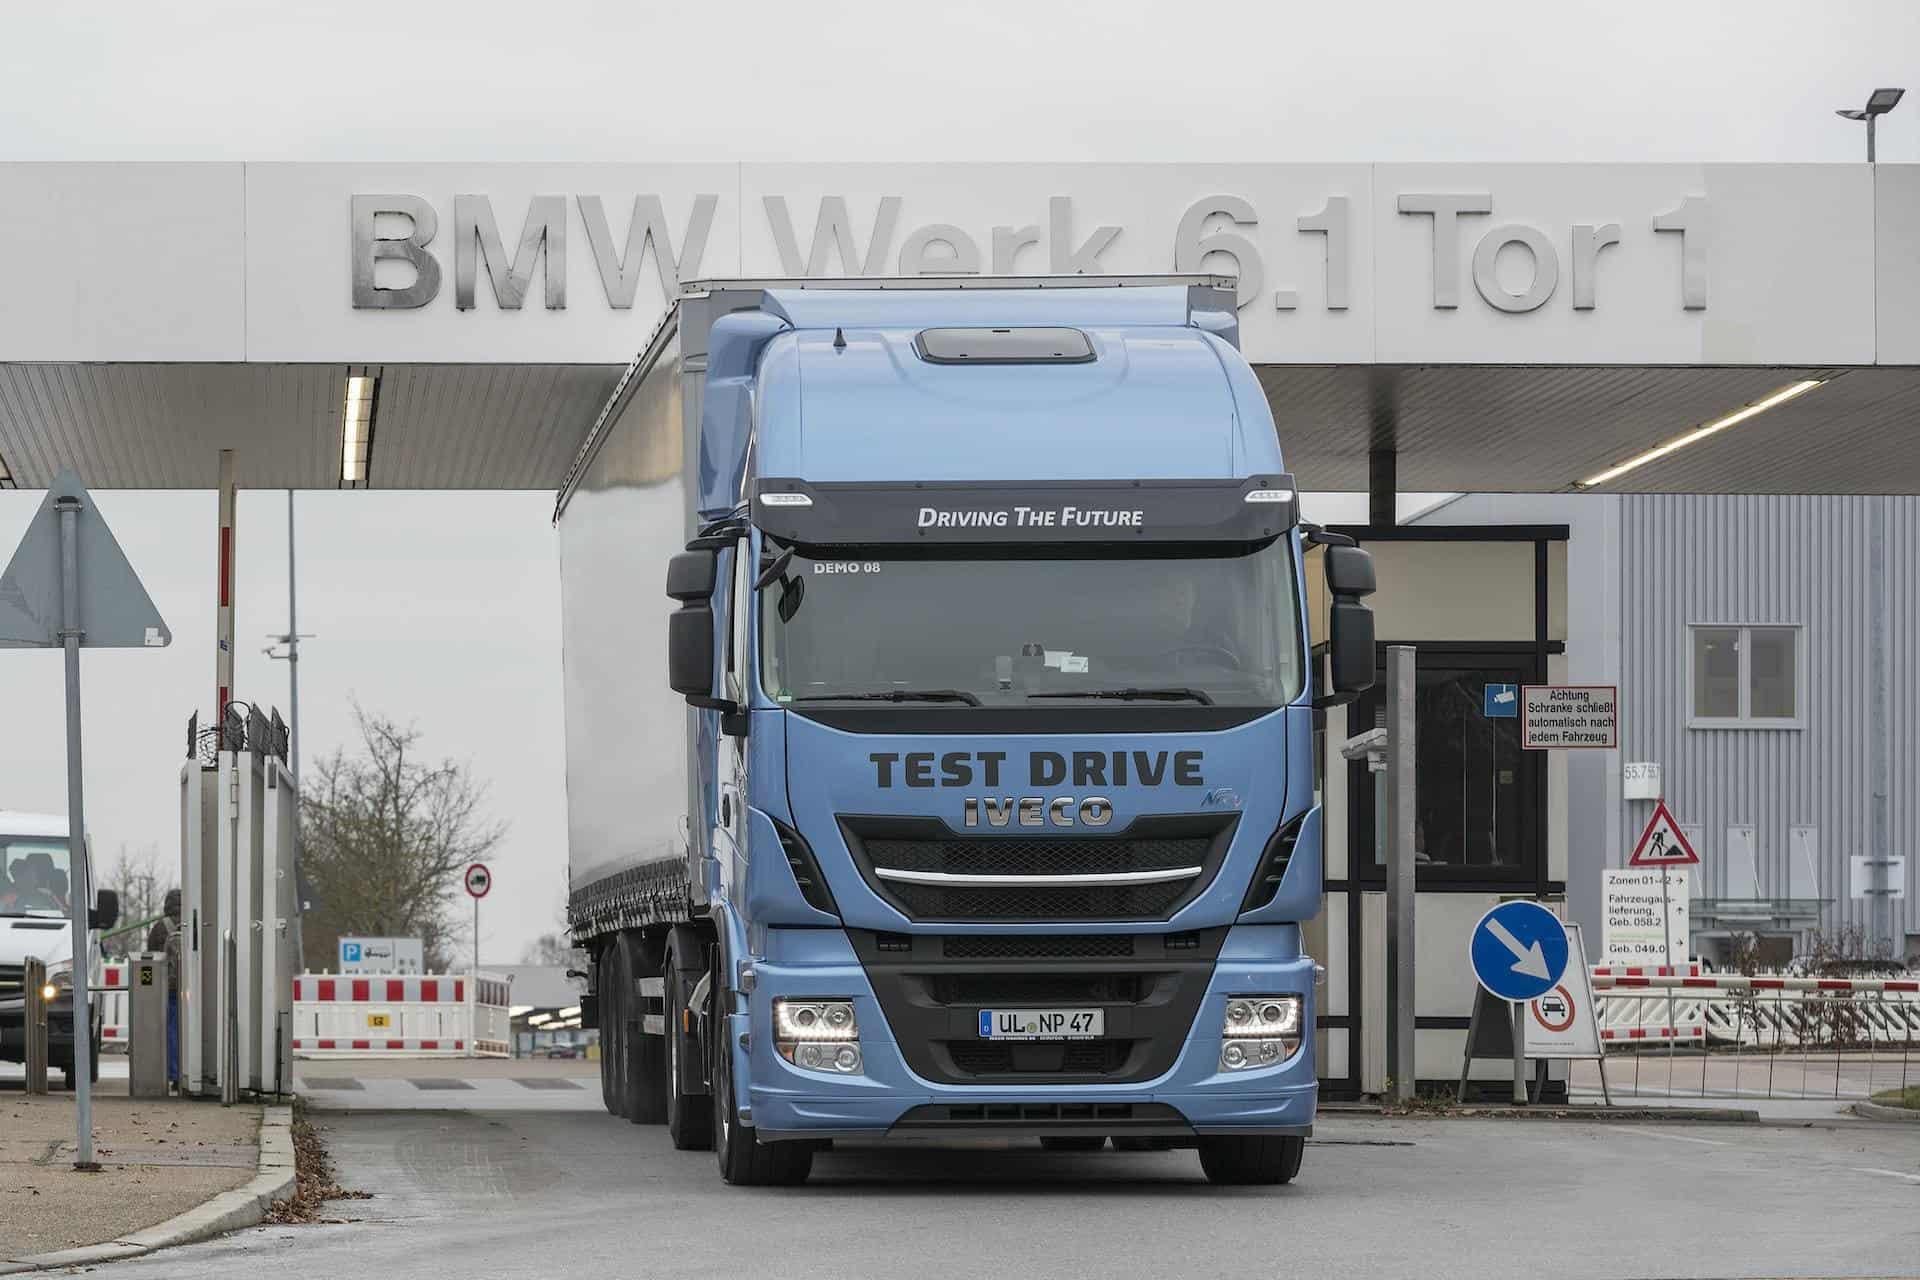 BMW-LNG-Fluessiggas-LKW